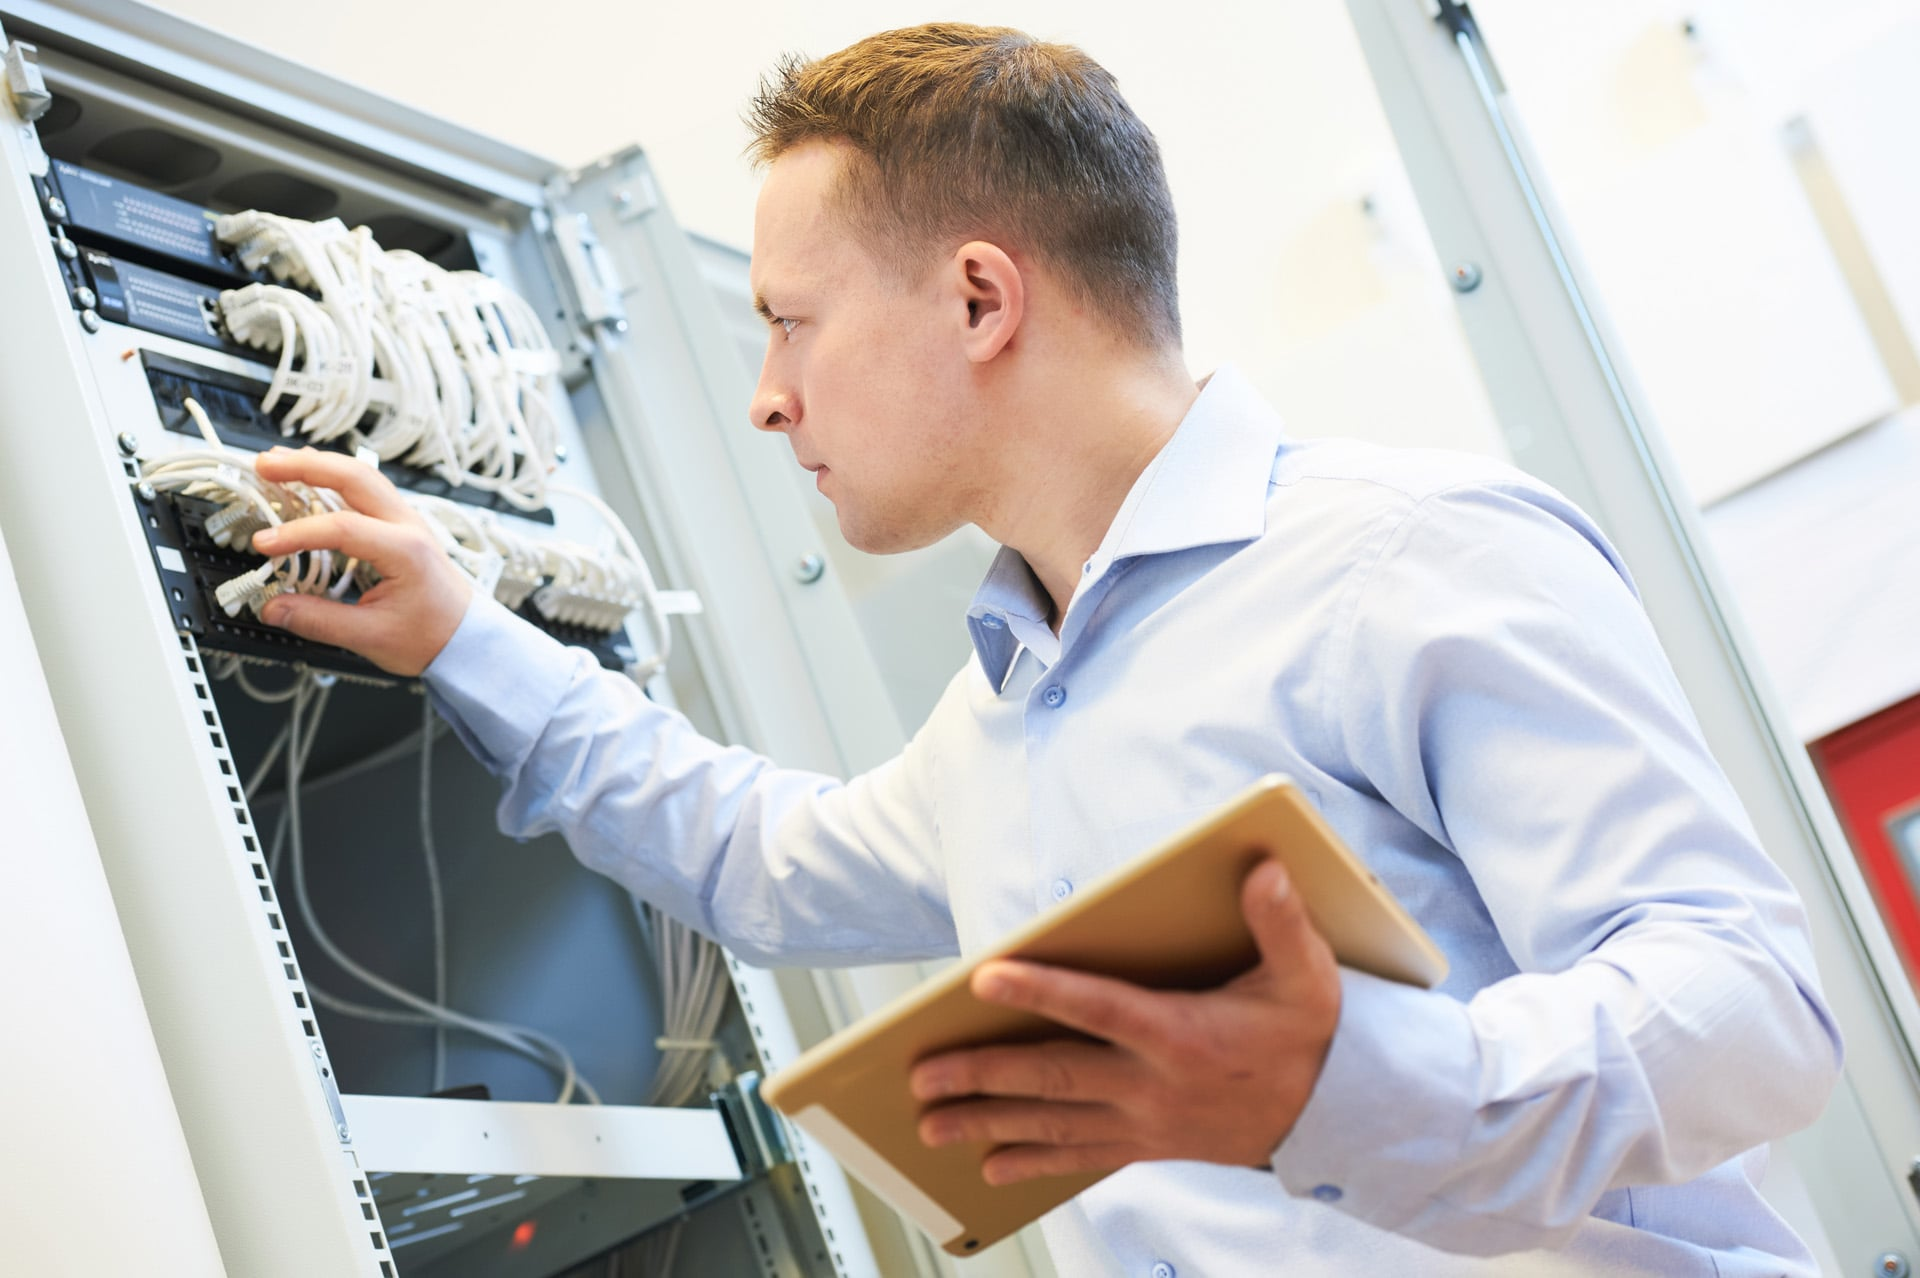 man-checking-server-cables.jpg